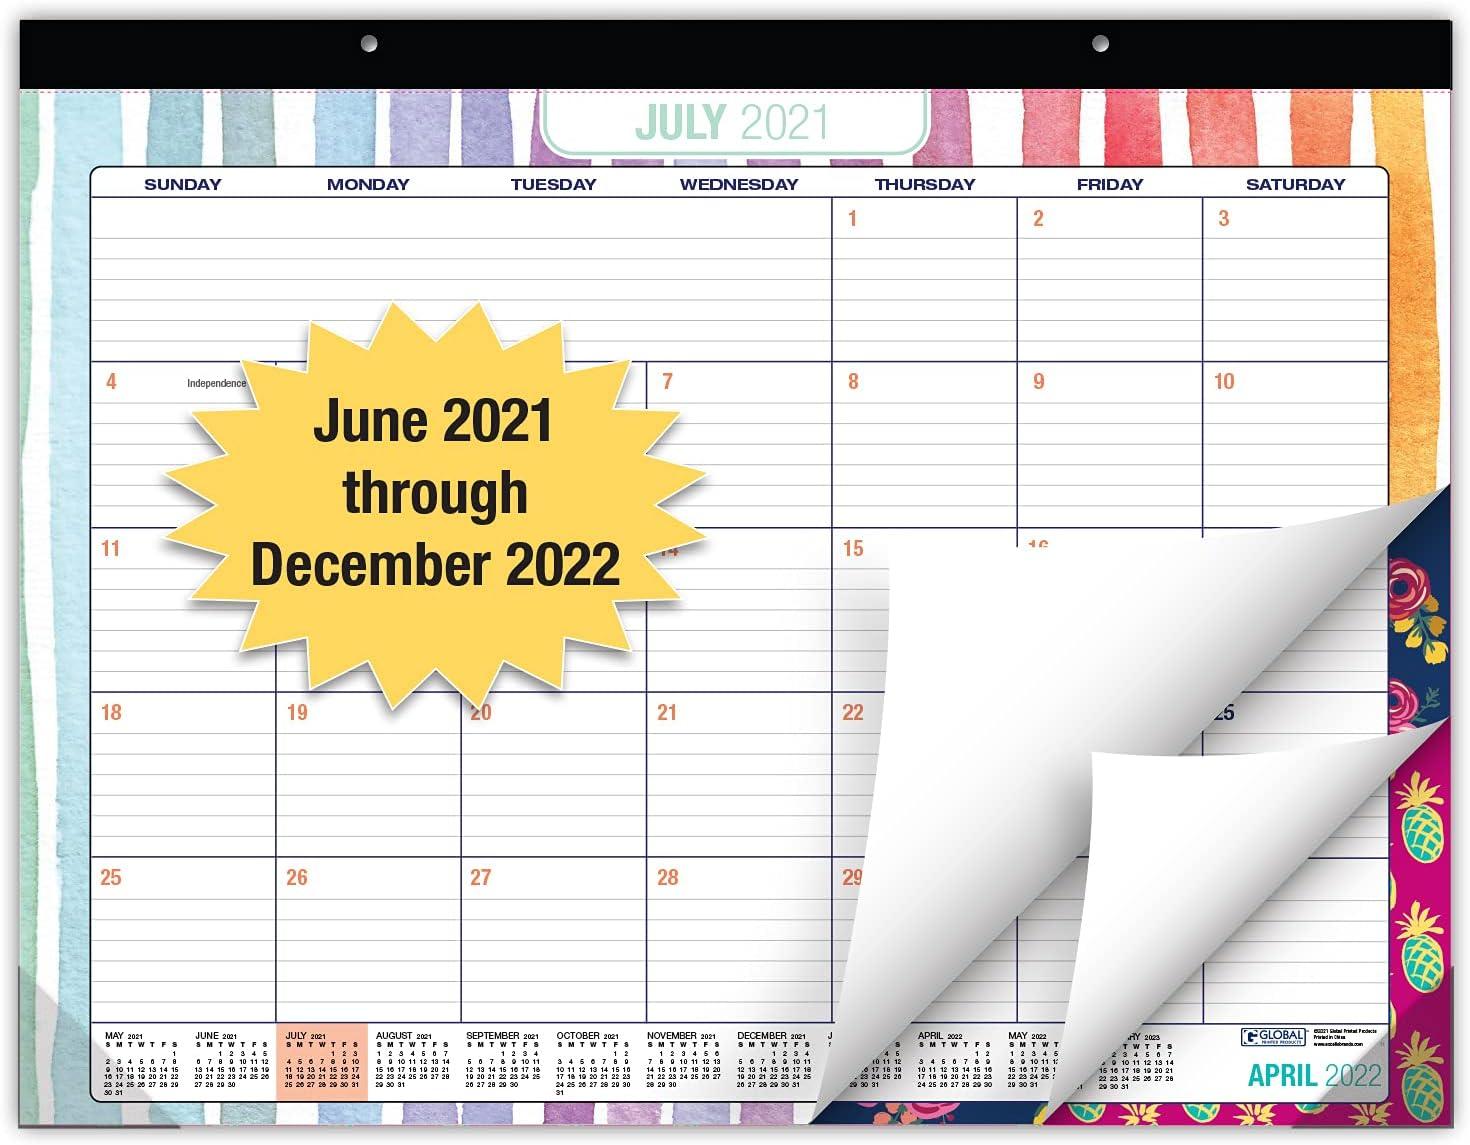 Desk Calendar 2021-2022: Large Monthly Pages - 22